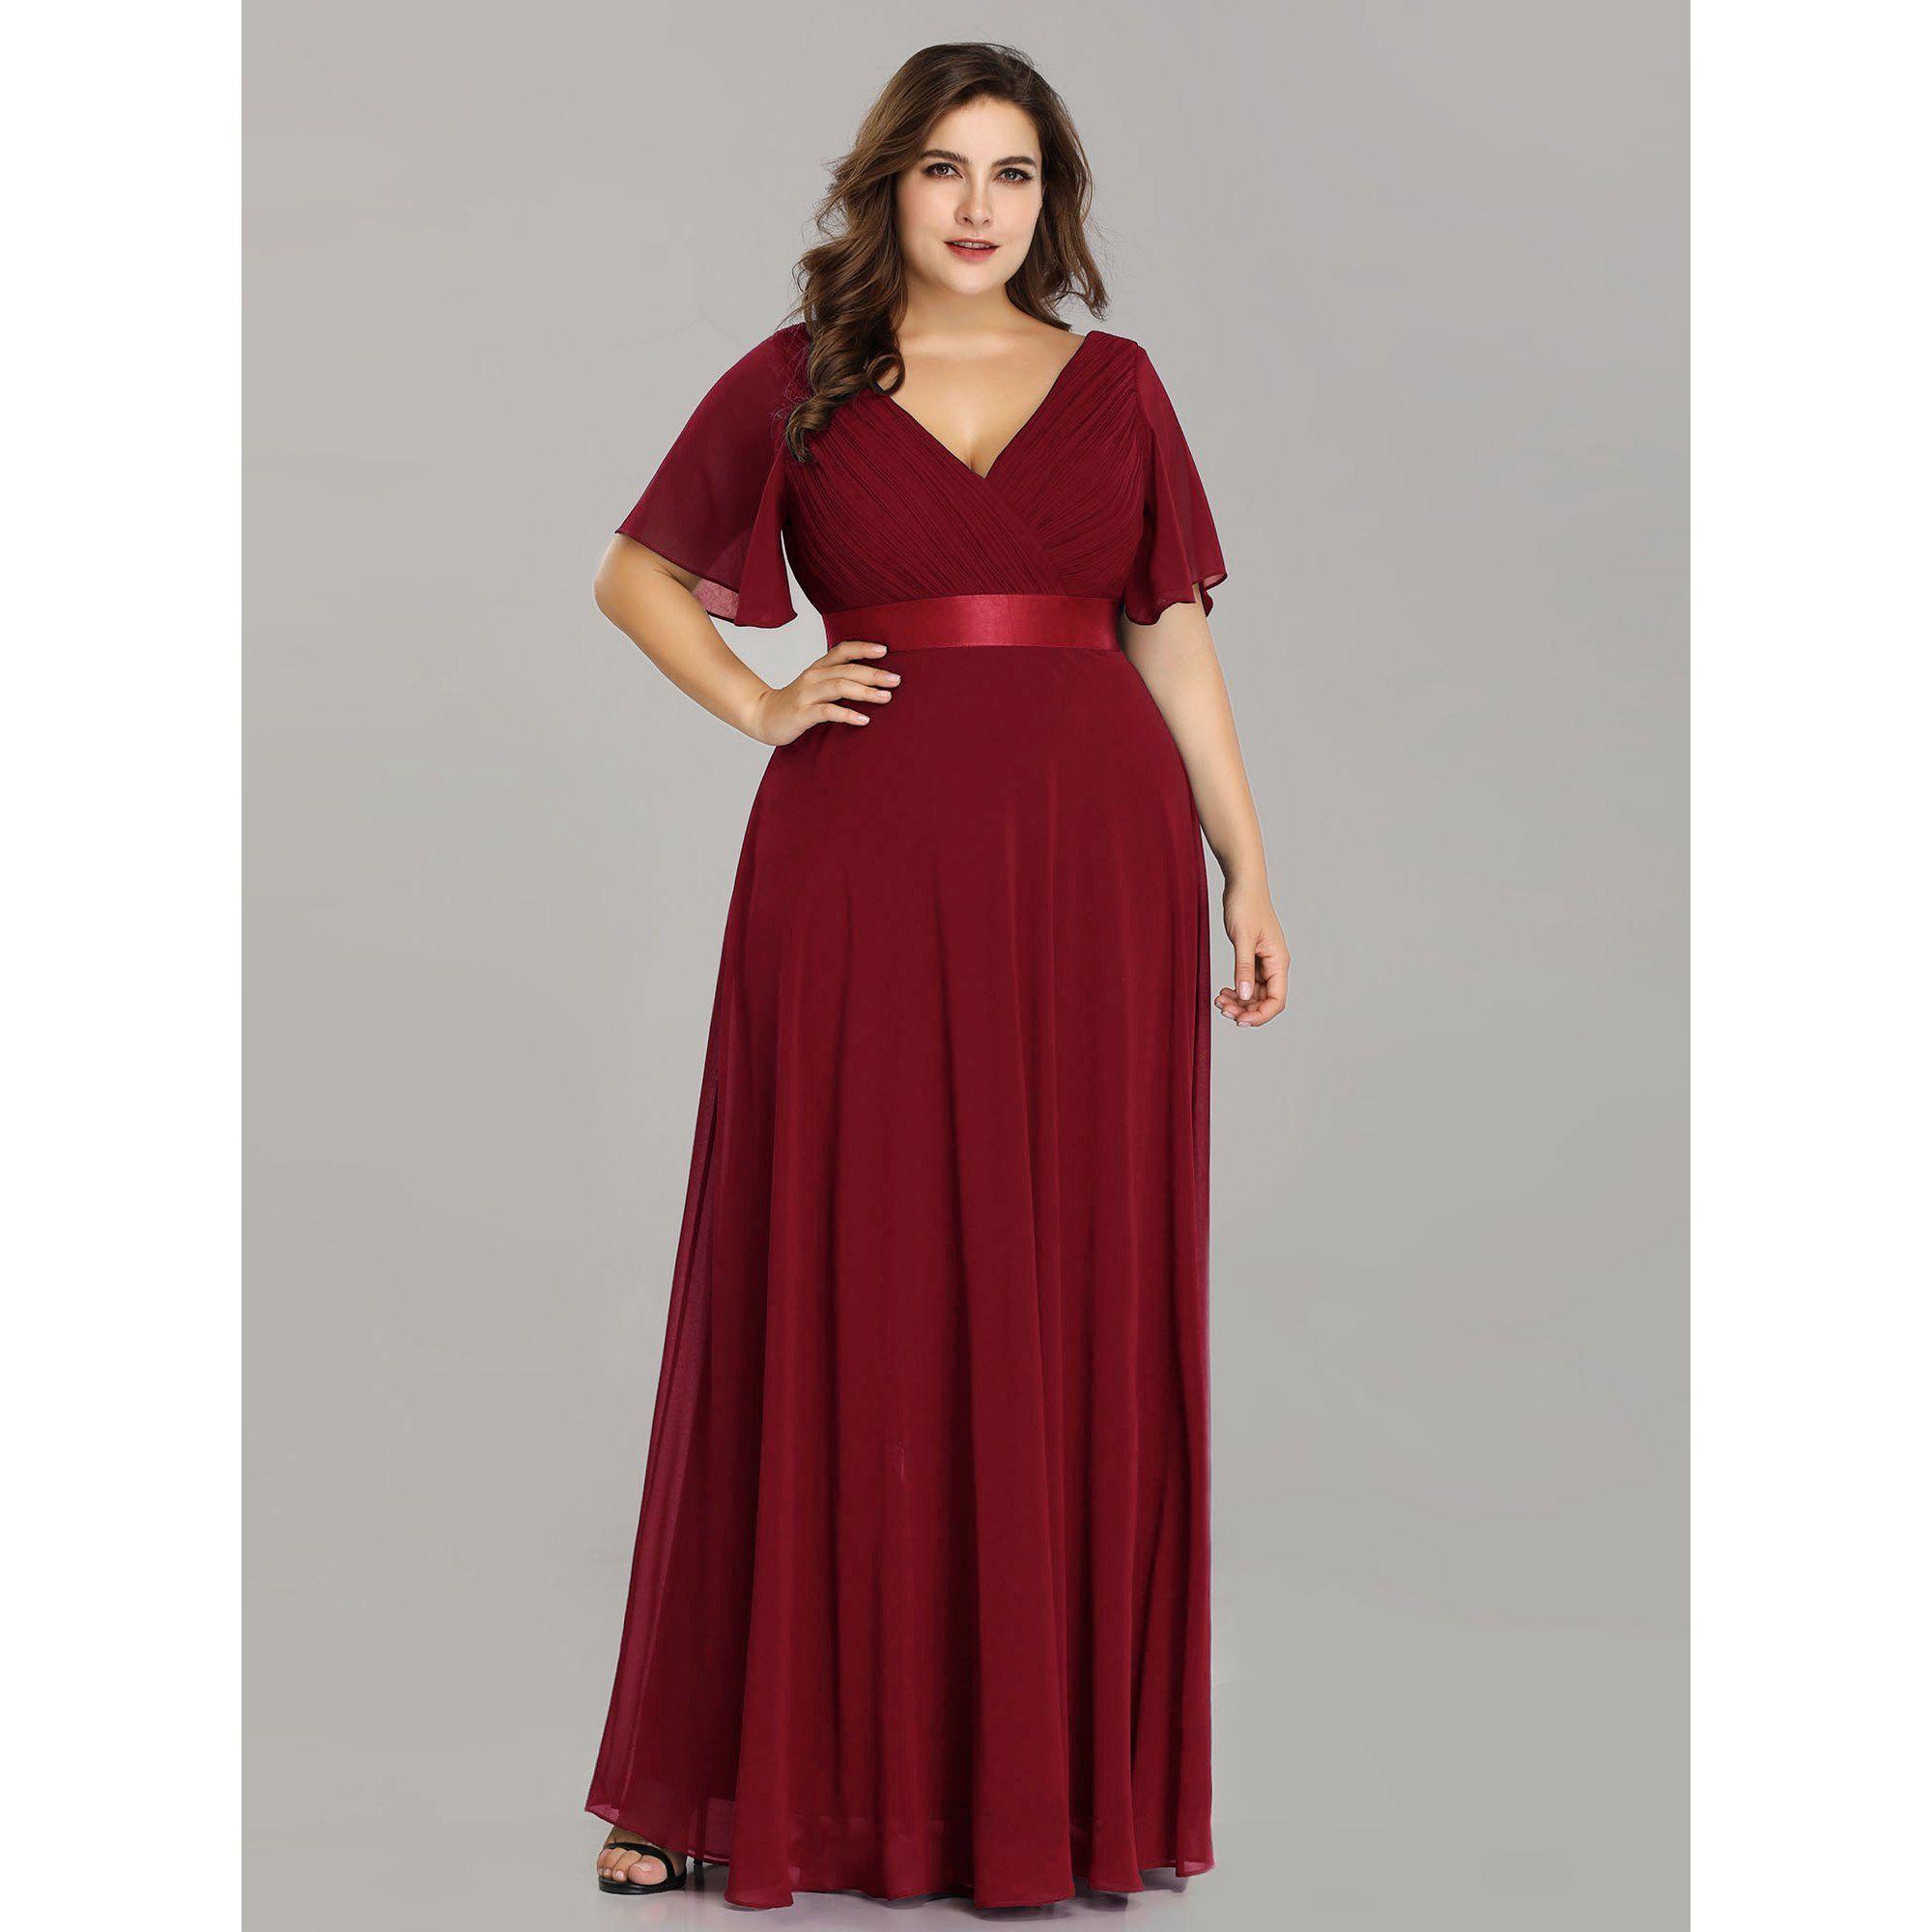 Ever Pretty Ever Pretty Womens Plus Size Bridesmaid Dresses For Women 98902 Burgundy Us22 Walmart Com Evening Dresses Plus Size Plus Size Long Dresses Empire Waist Evening Dress [ 2000 x 2000 Pixel ]